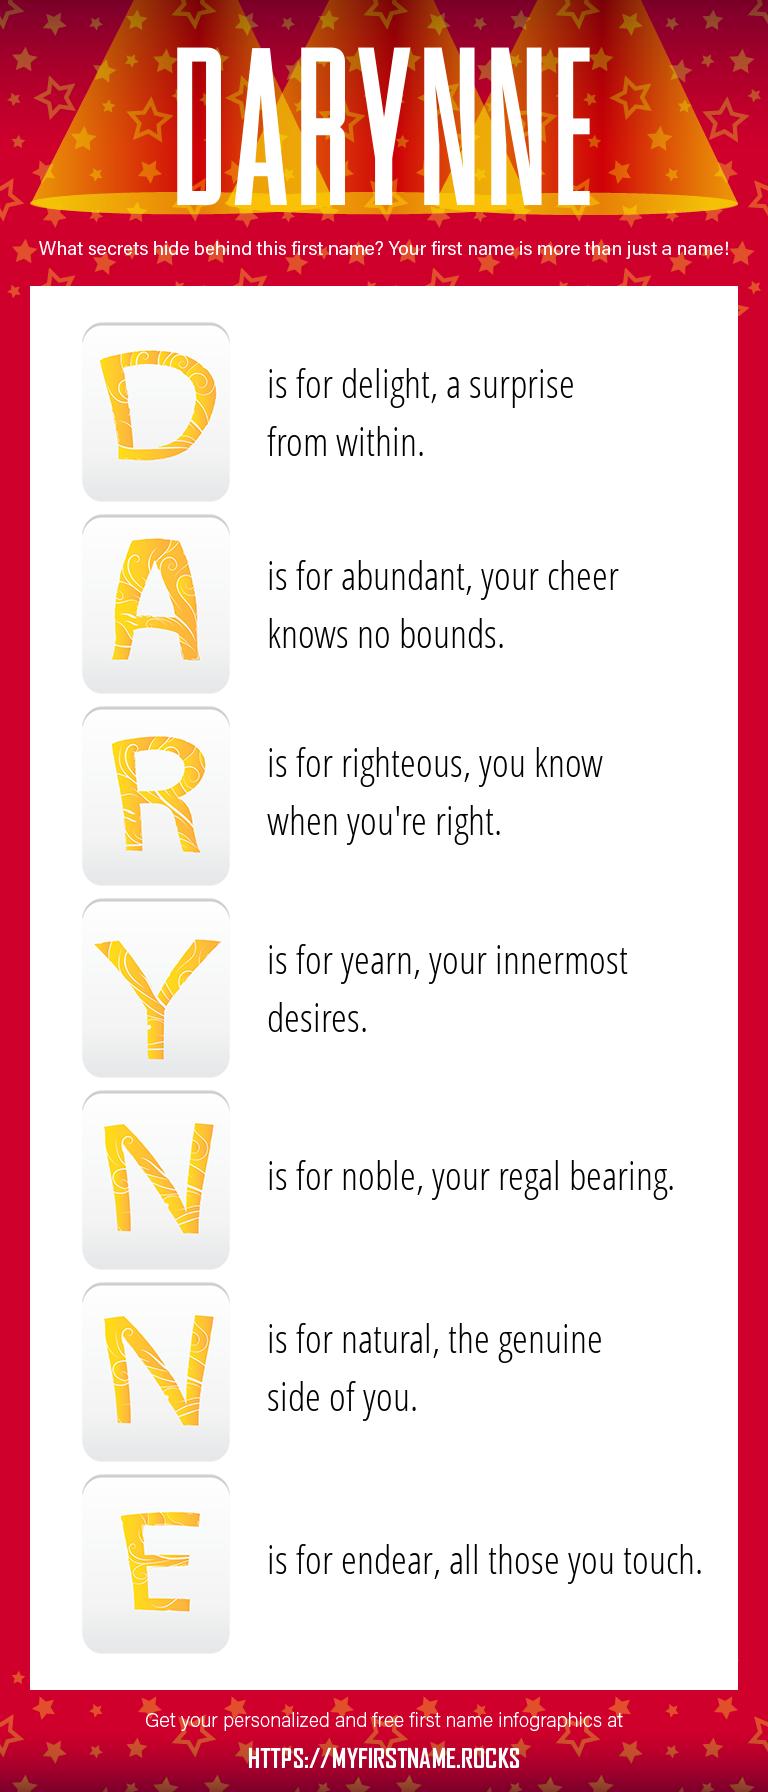 Darynne Infographics